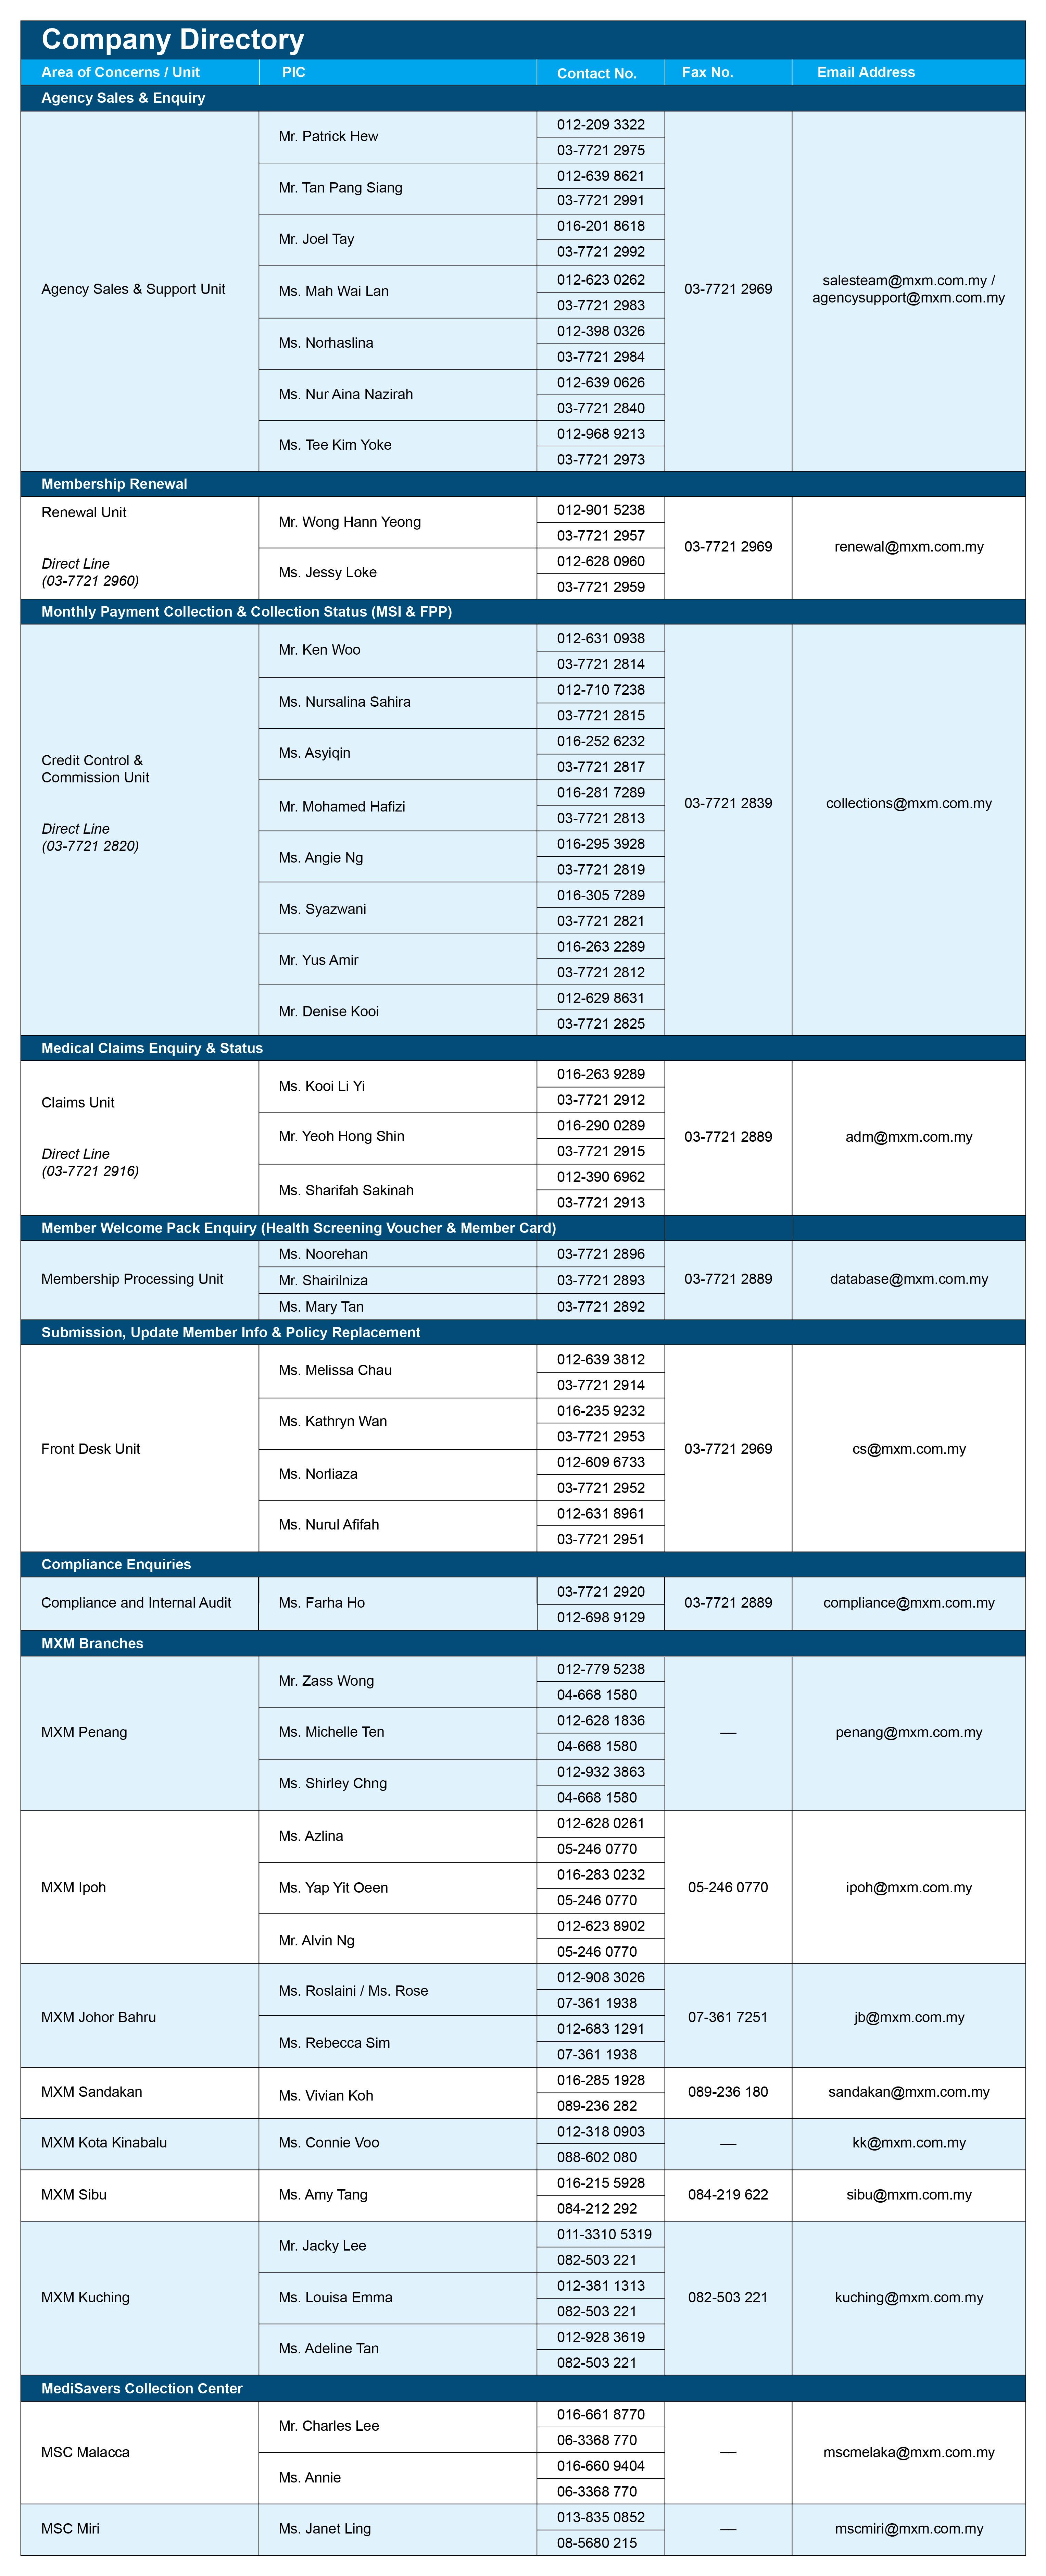 MXM Company Directory